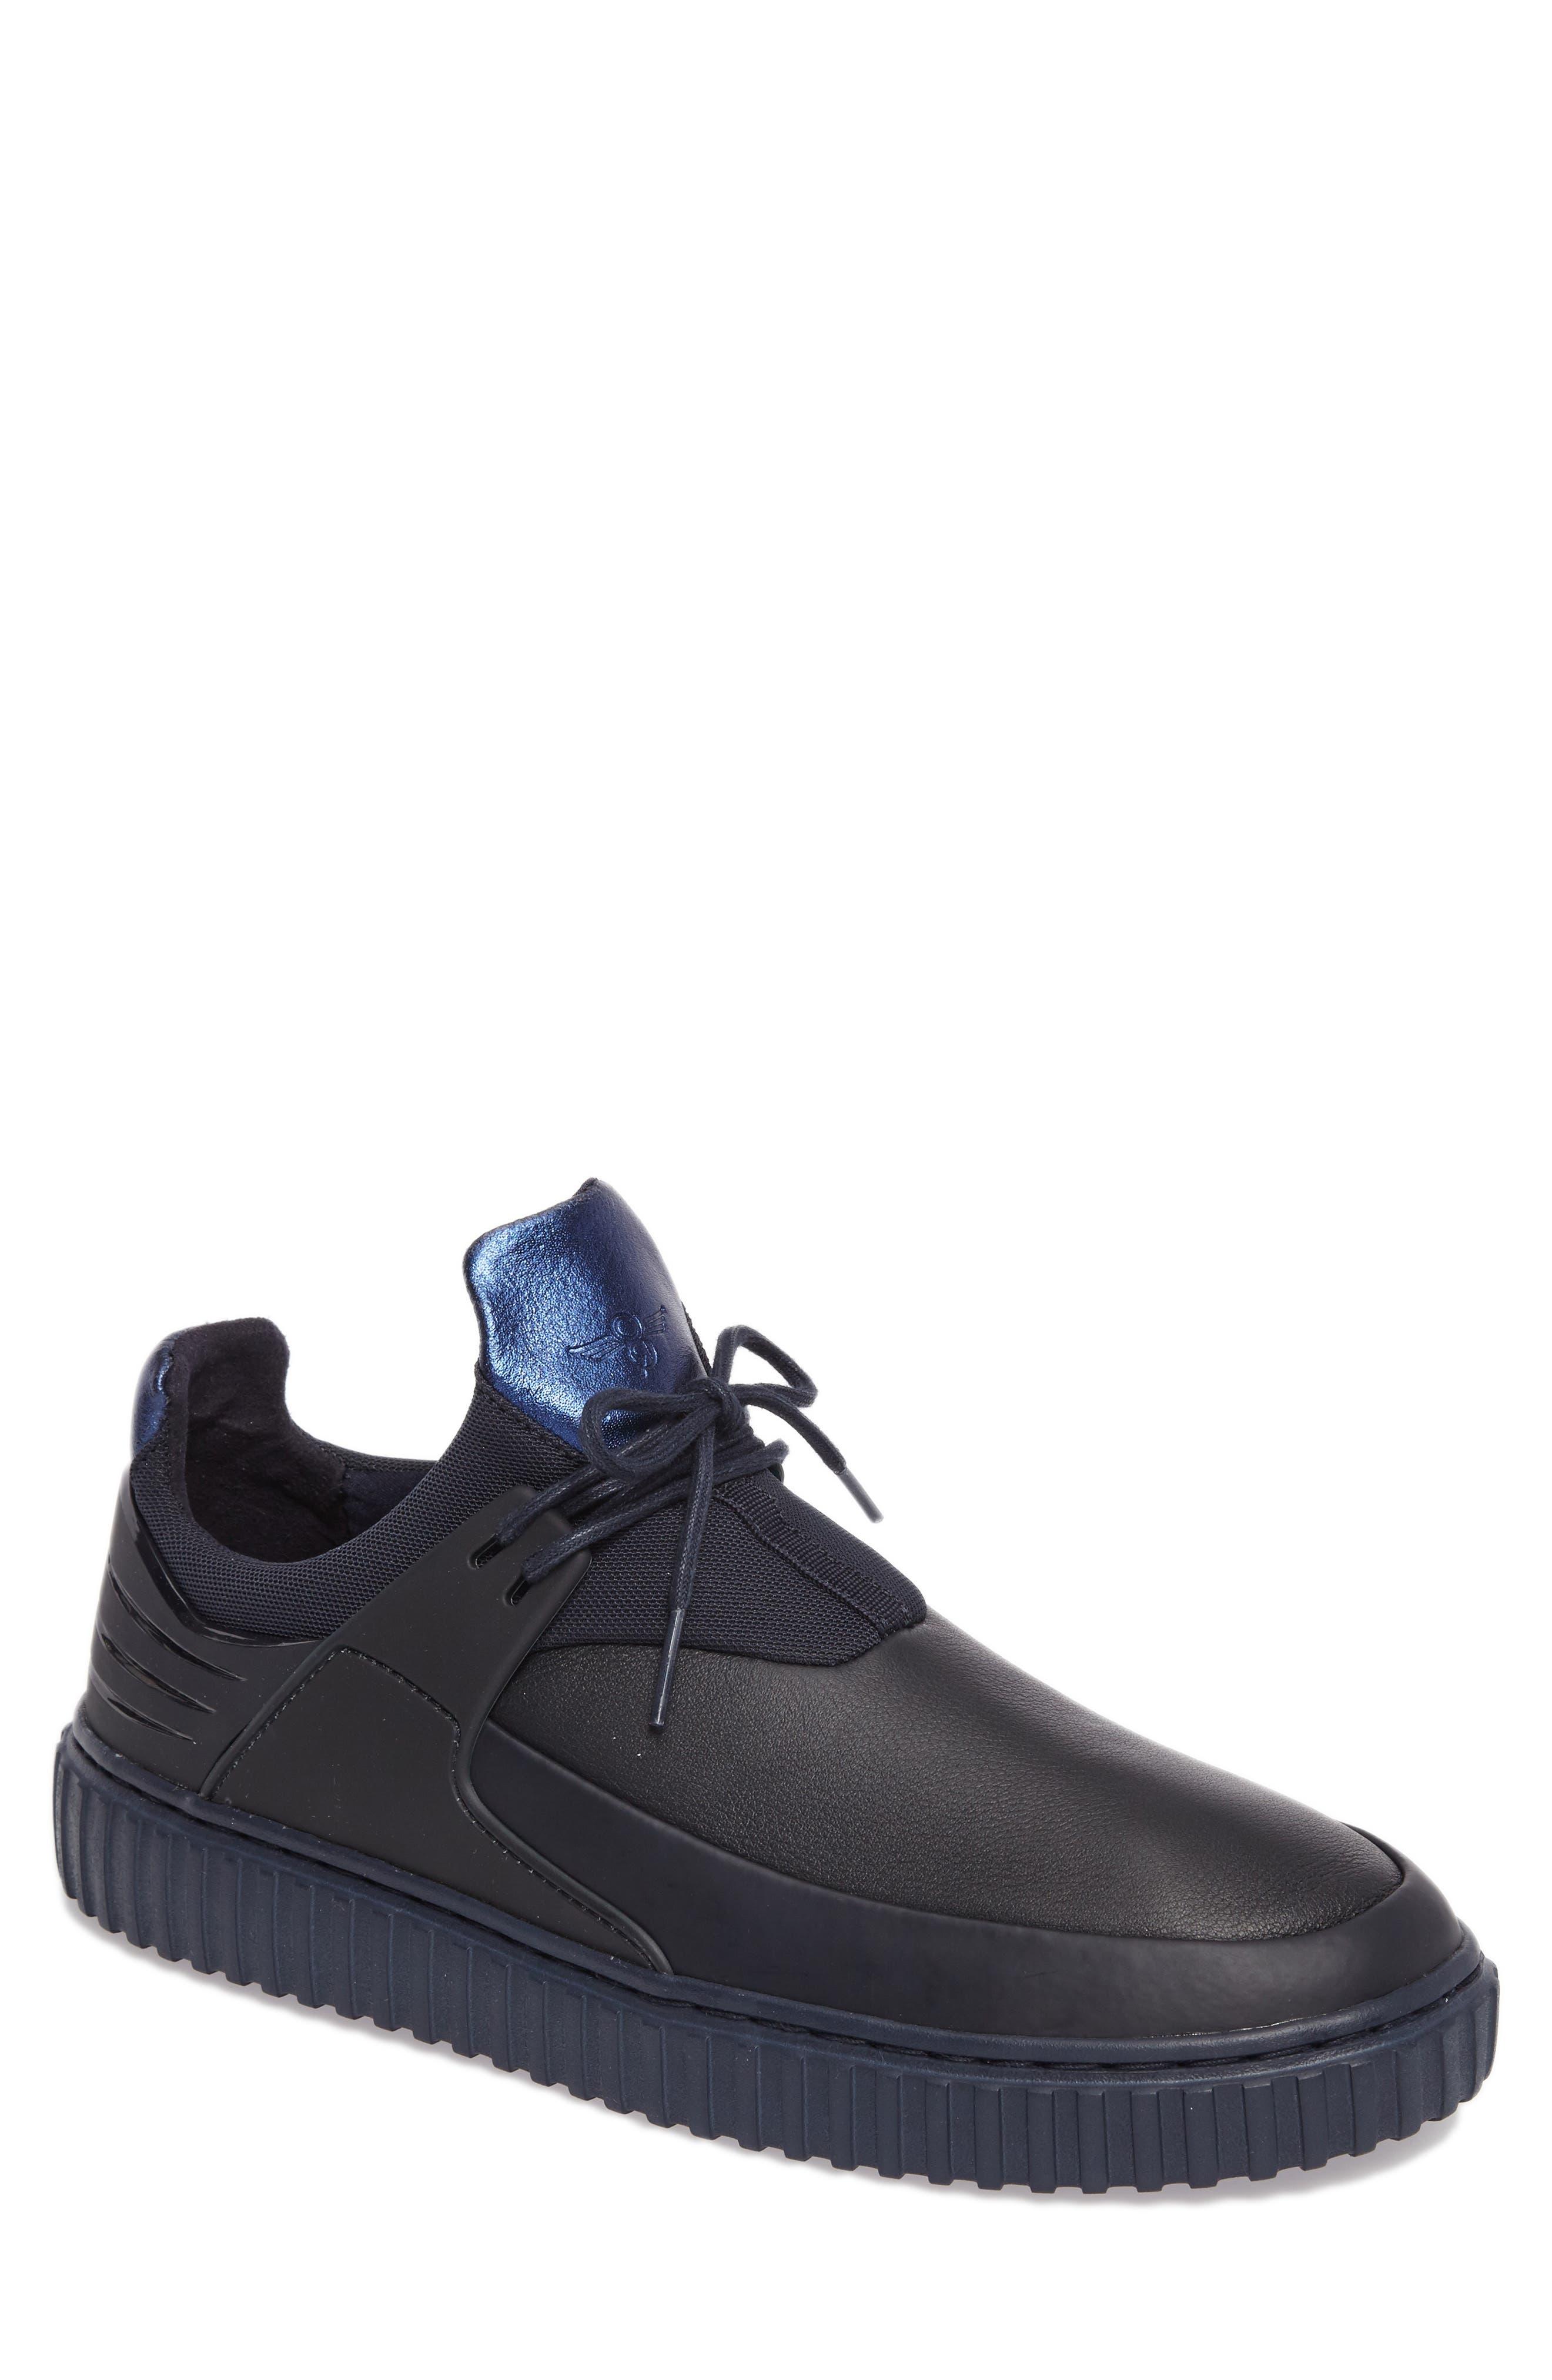 Main Image - Creative Recreation Castucci Mid Sneaker (Men)